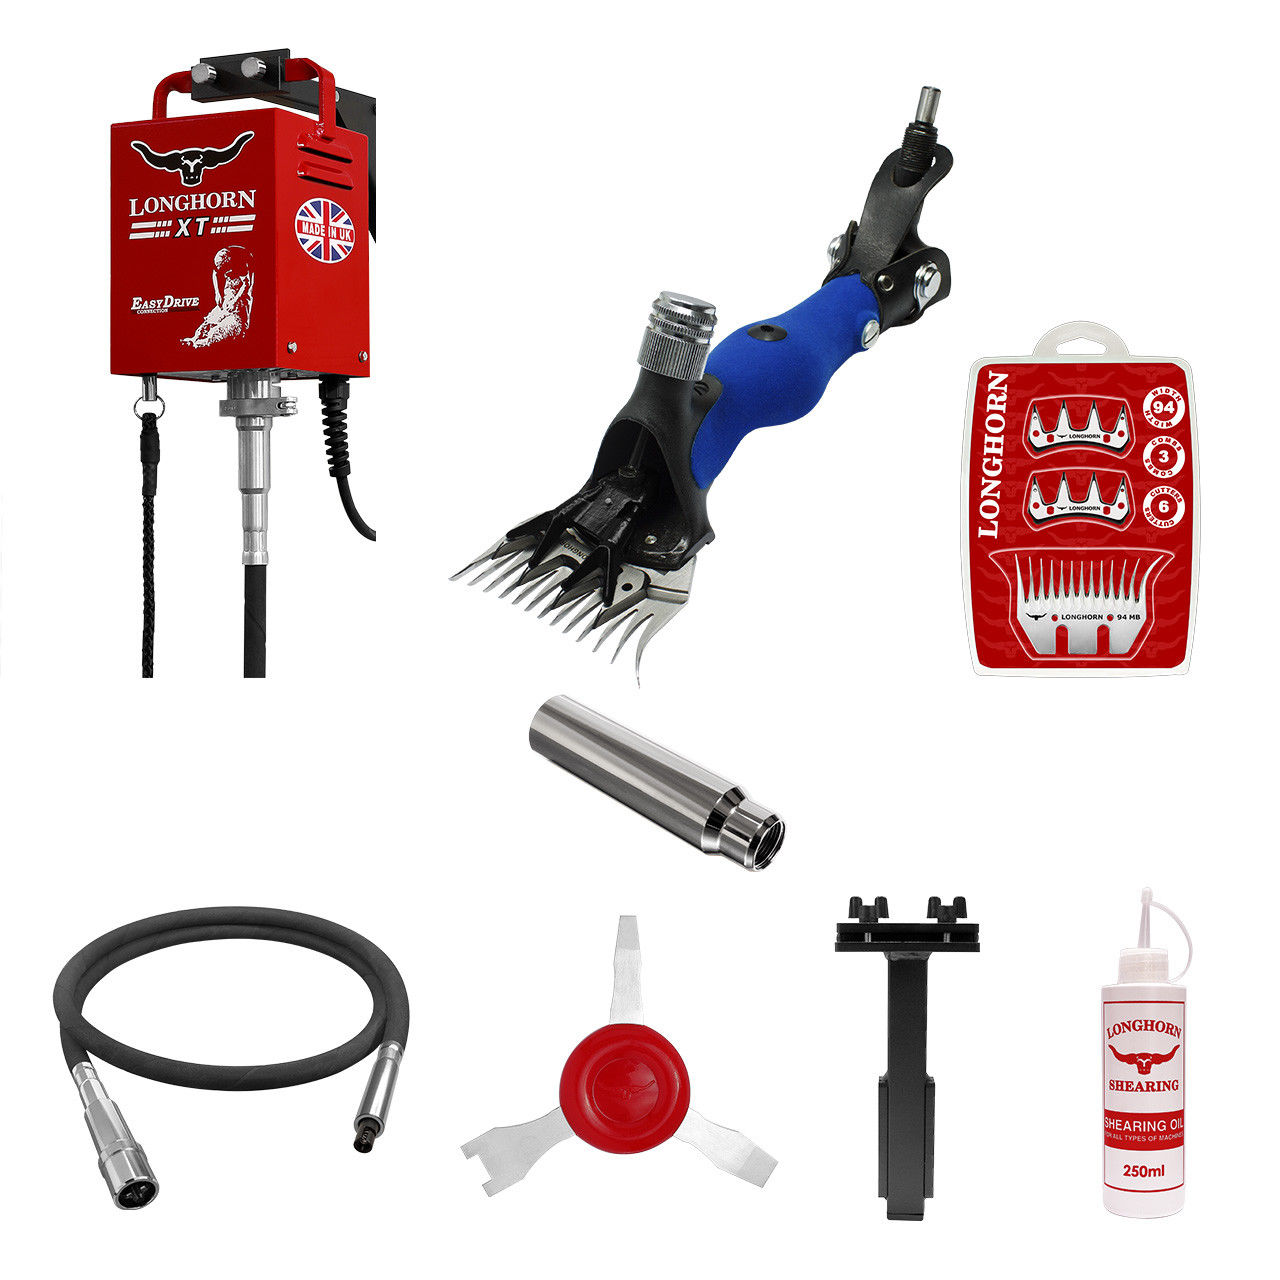 Longhorn® XT PIN Kit inkl. Antrieb, Welle, Handstück, uvm.